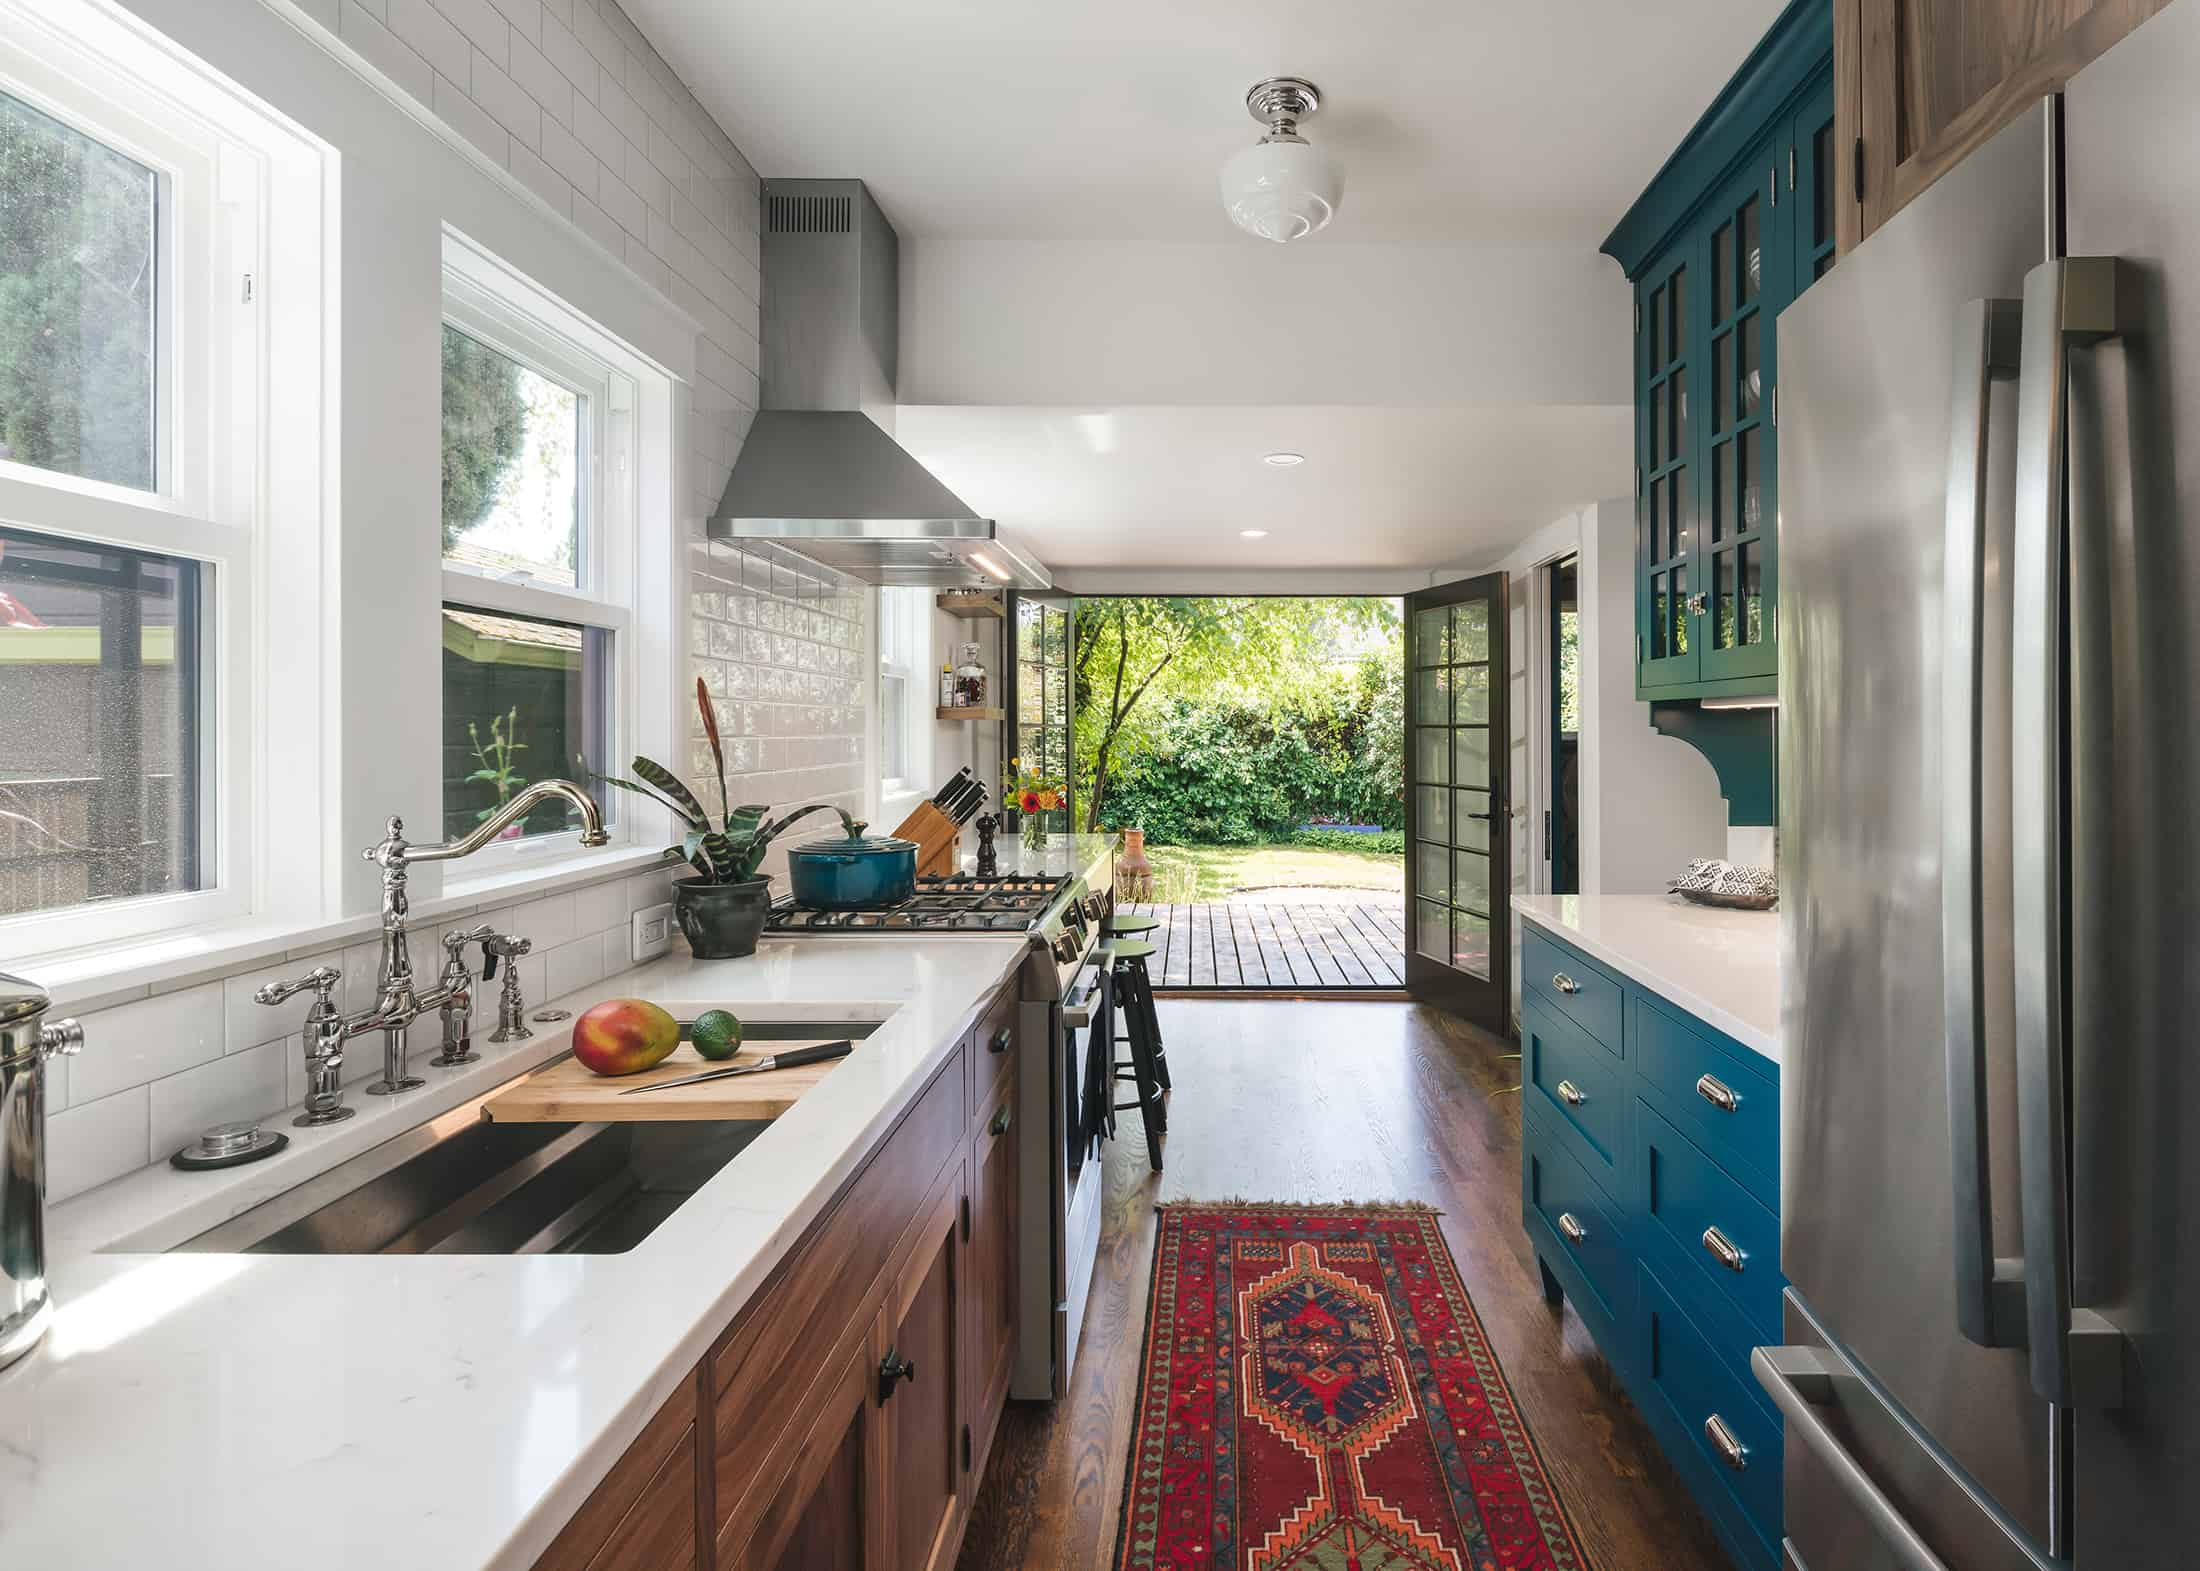 Portland, Oregon kitchen featuring aspects of Biophilic Design